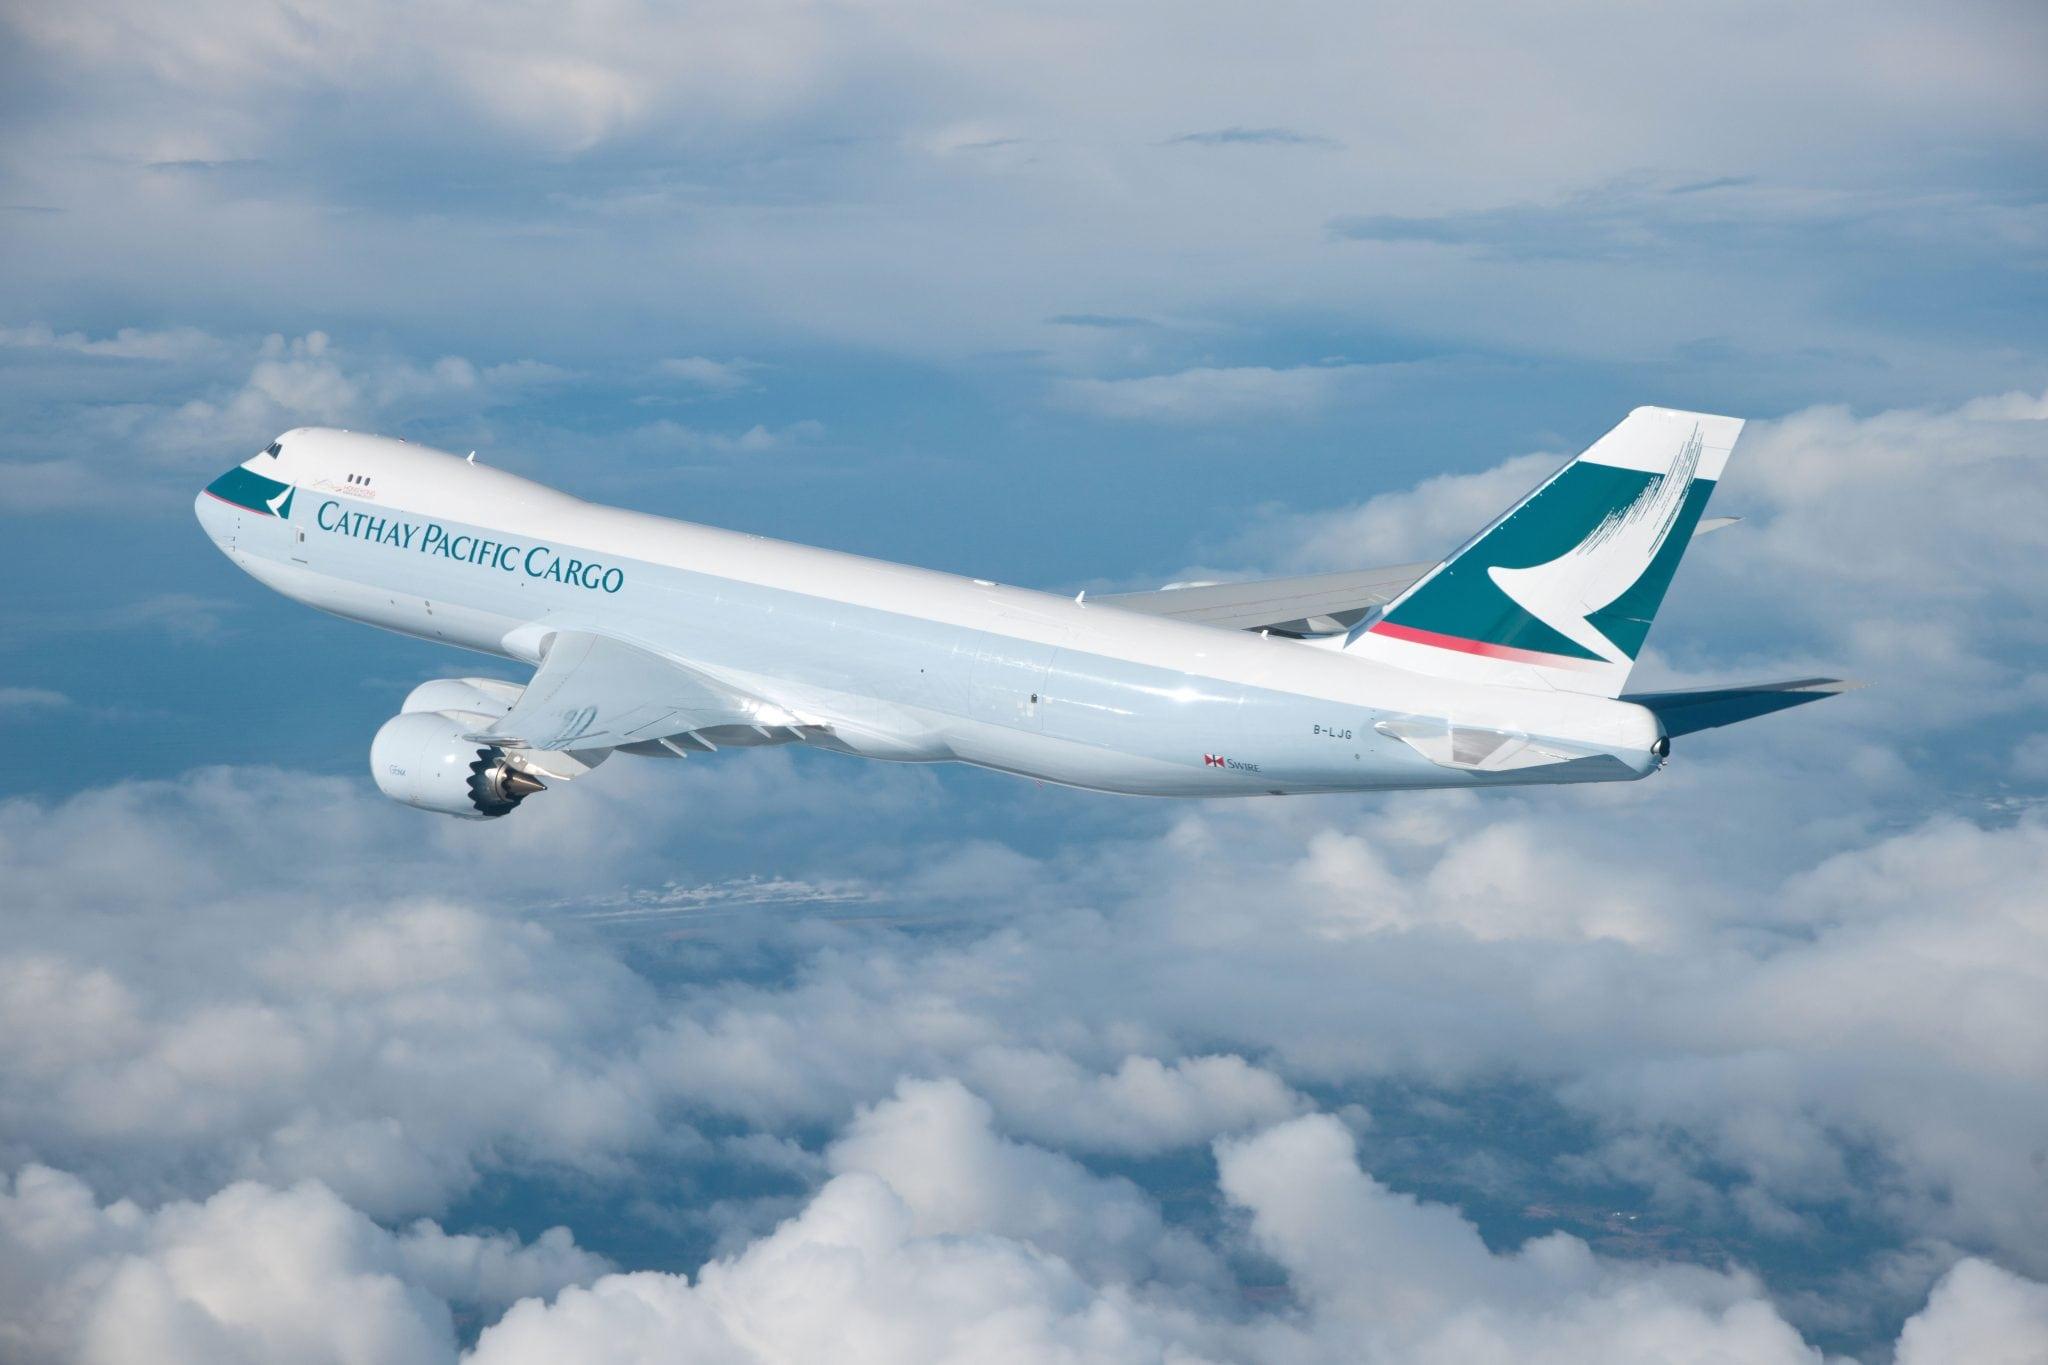 A Cathay Pacific Airways cargo flight